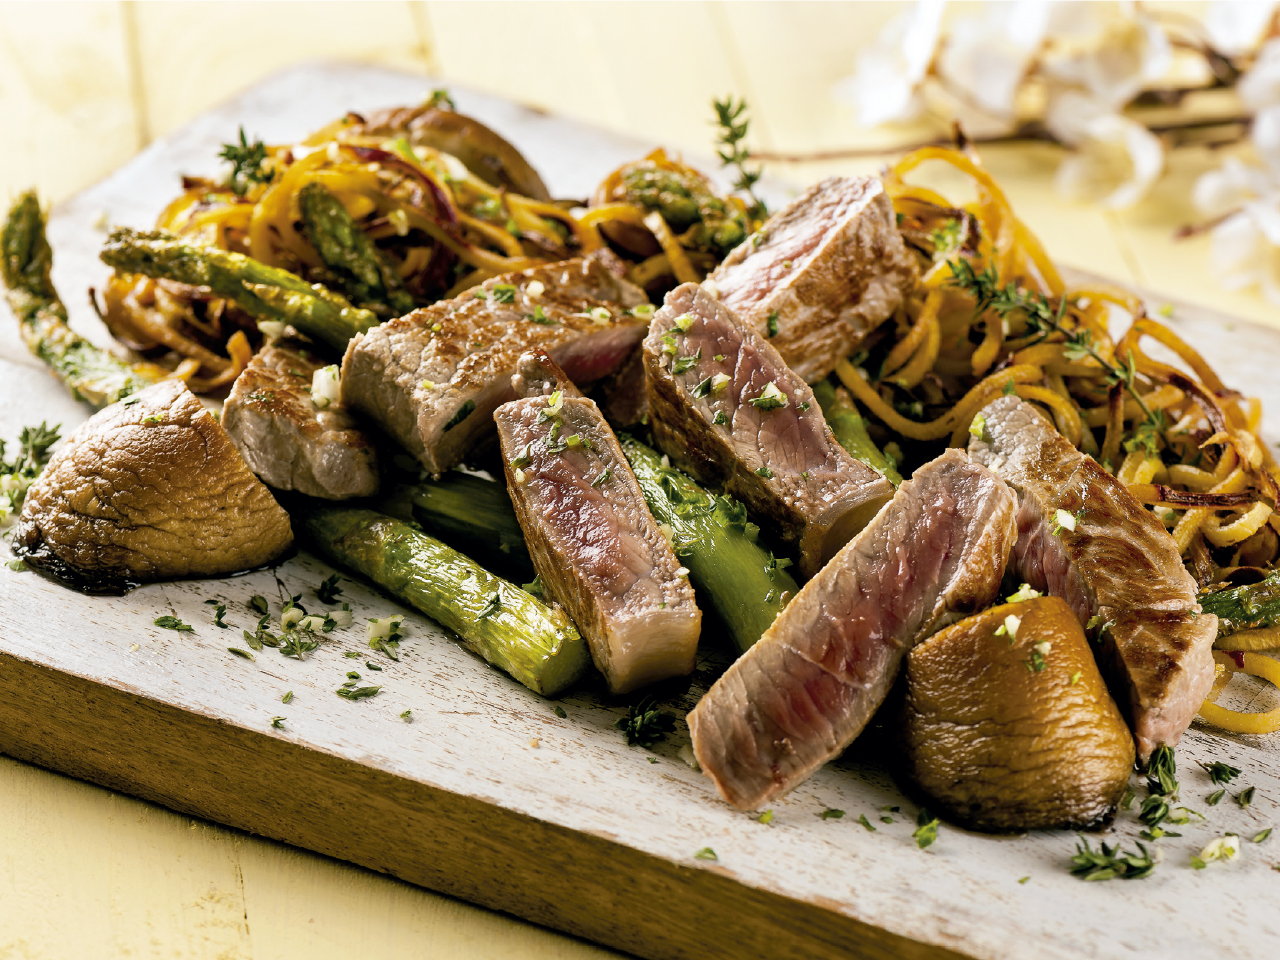 bife-cogumelos-batata